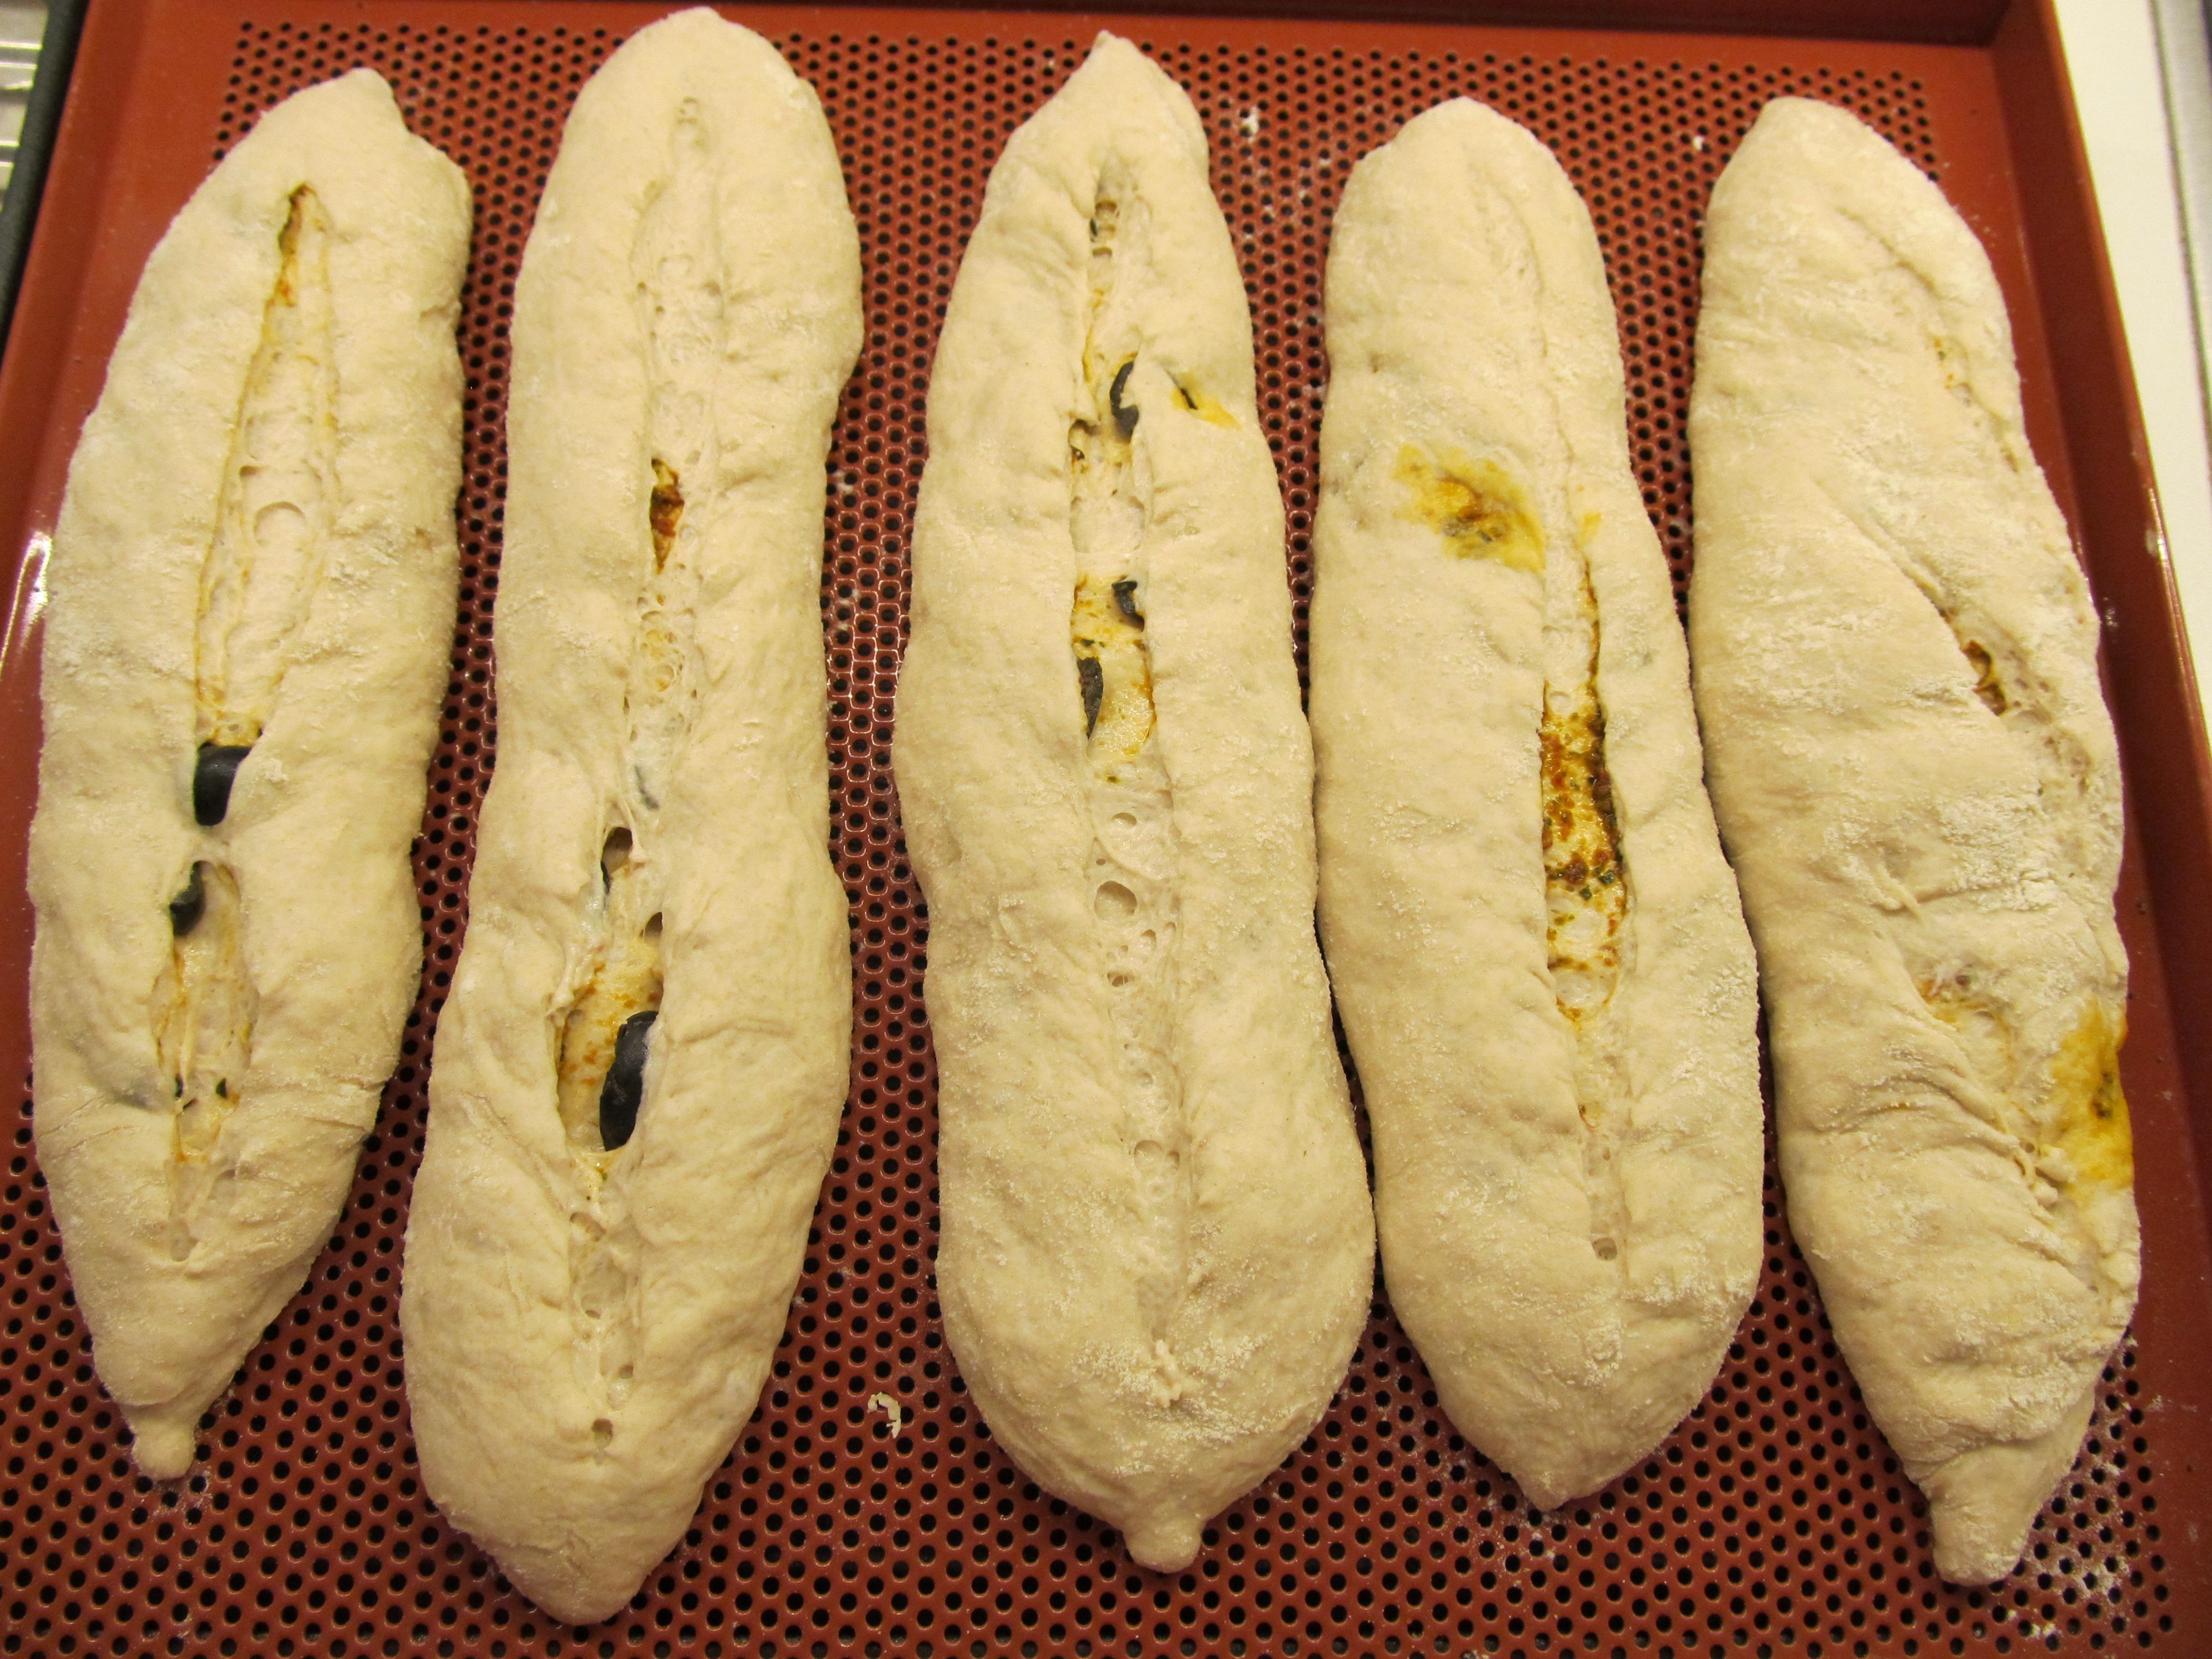 Free produce baking dessert cuisine bread dough